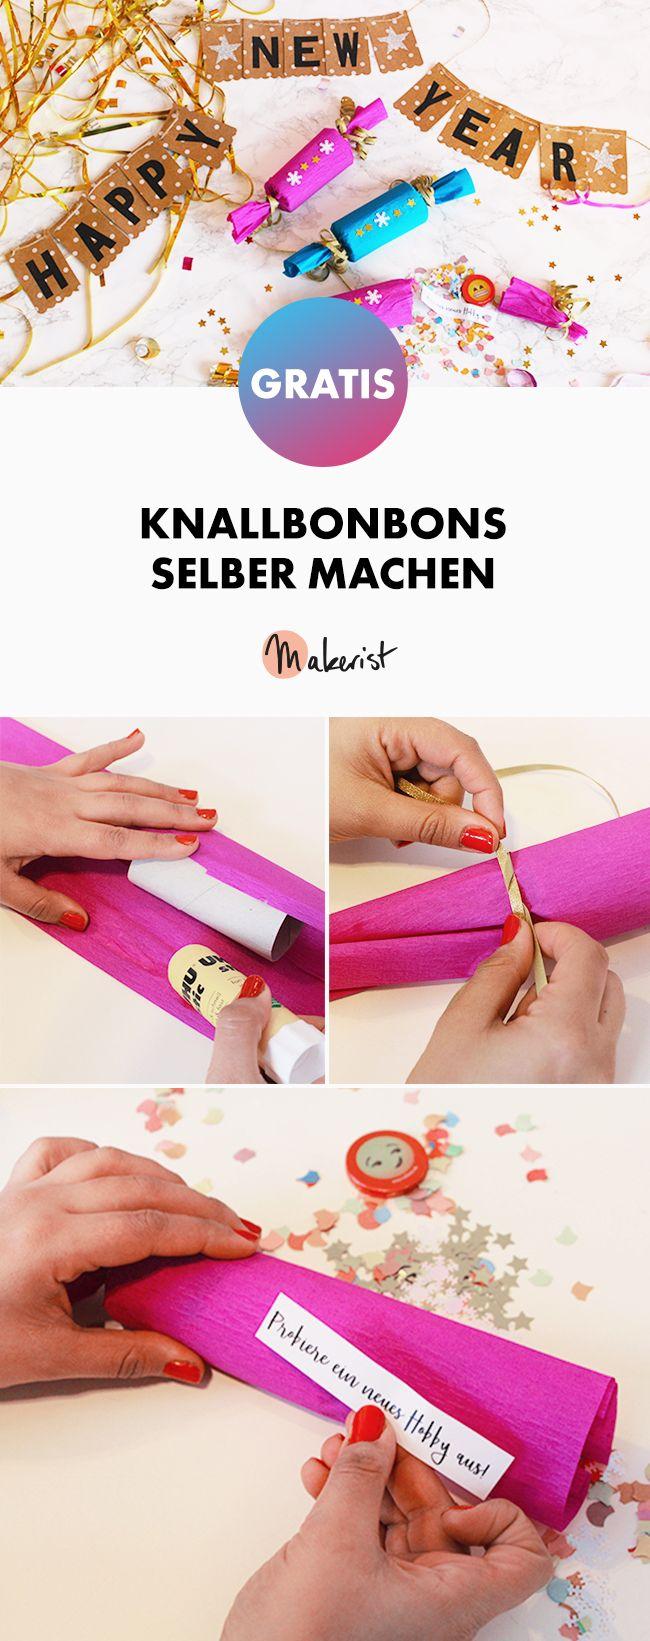 Für Silvester: Knallbonbons selber machen - kostenlose DIY-Anleitung via Makerist.de